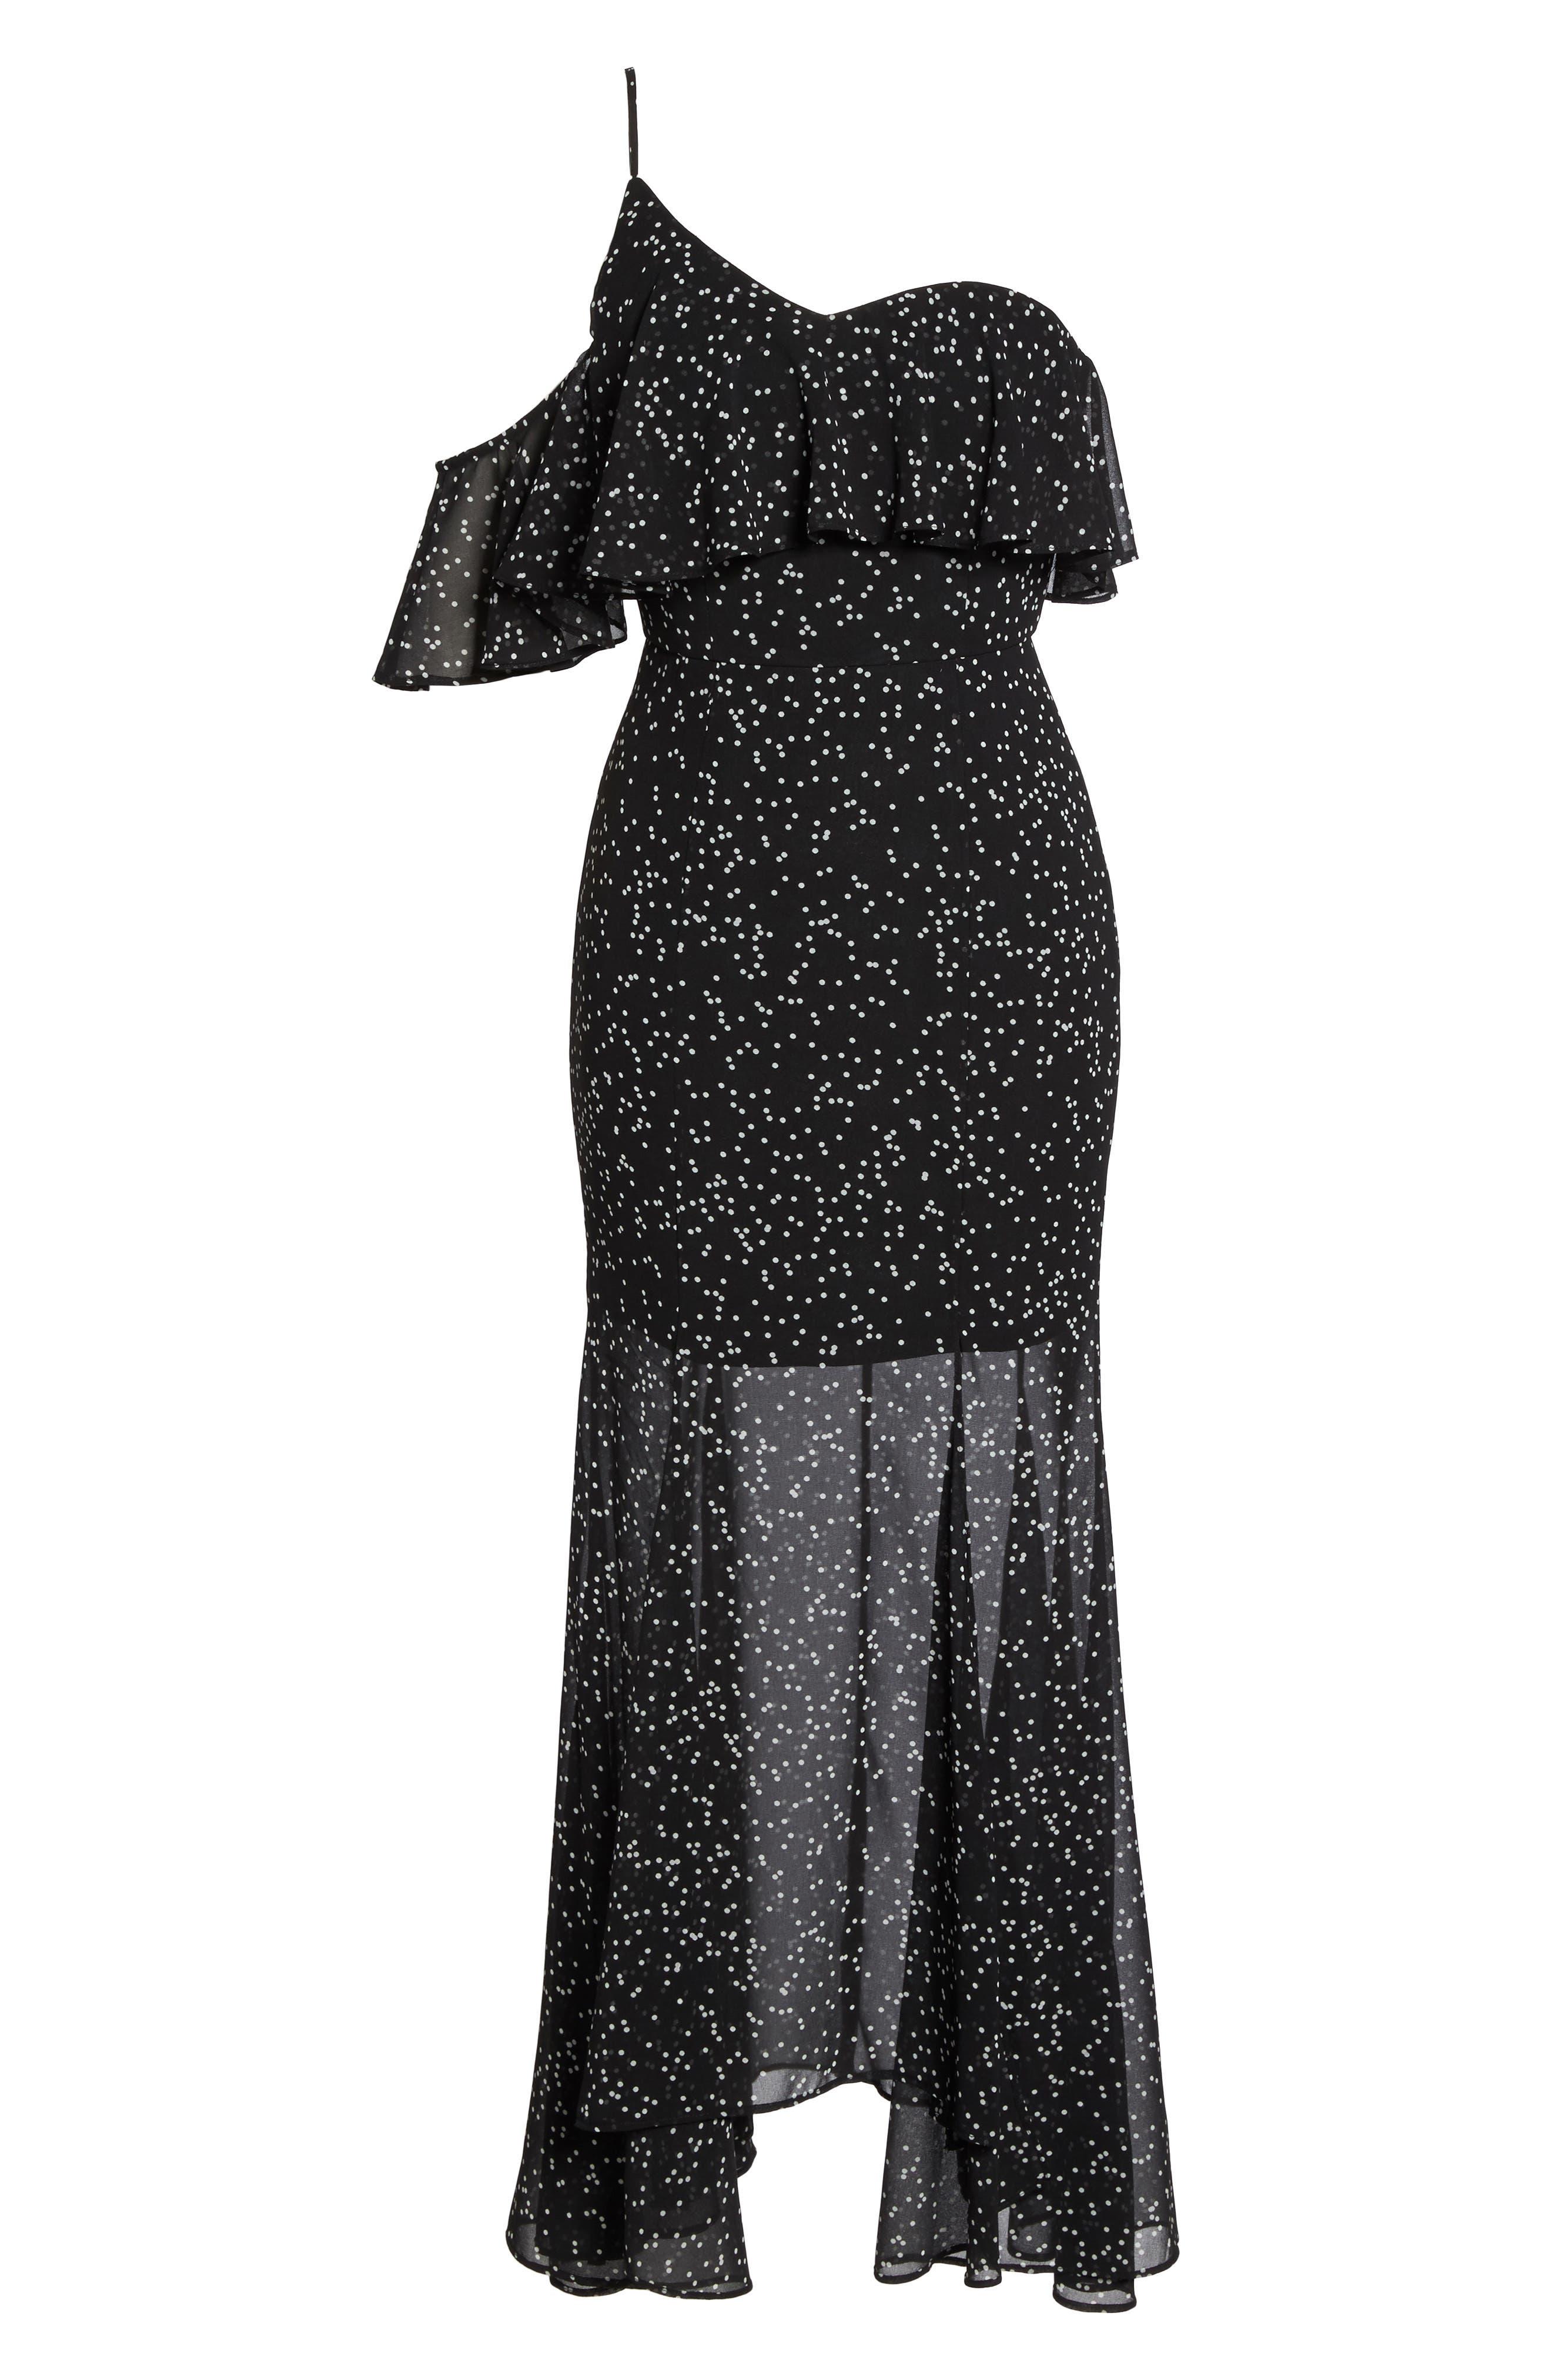 Embrace One Shoulder Dress,                             Alternate thumbnail 7, color,                             Black W White Spot